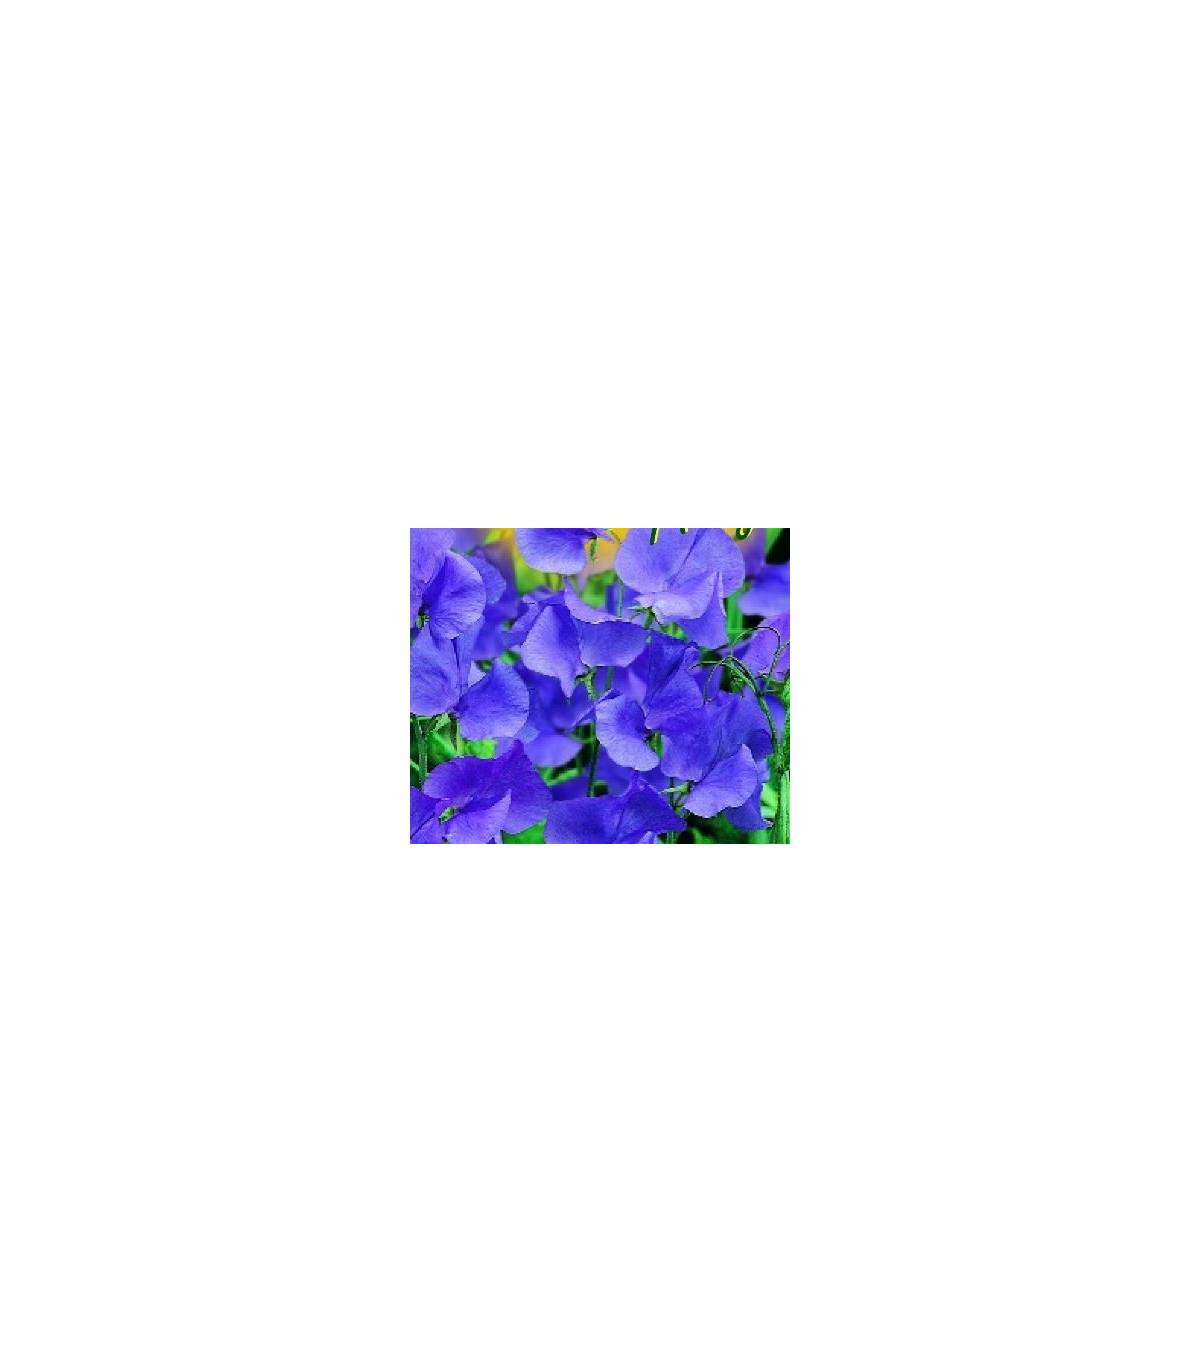 Hrachor pnoucí modrý- semena hrachoru- 20 ks